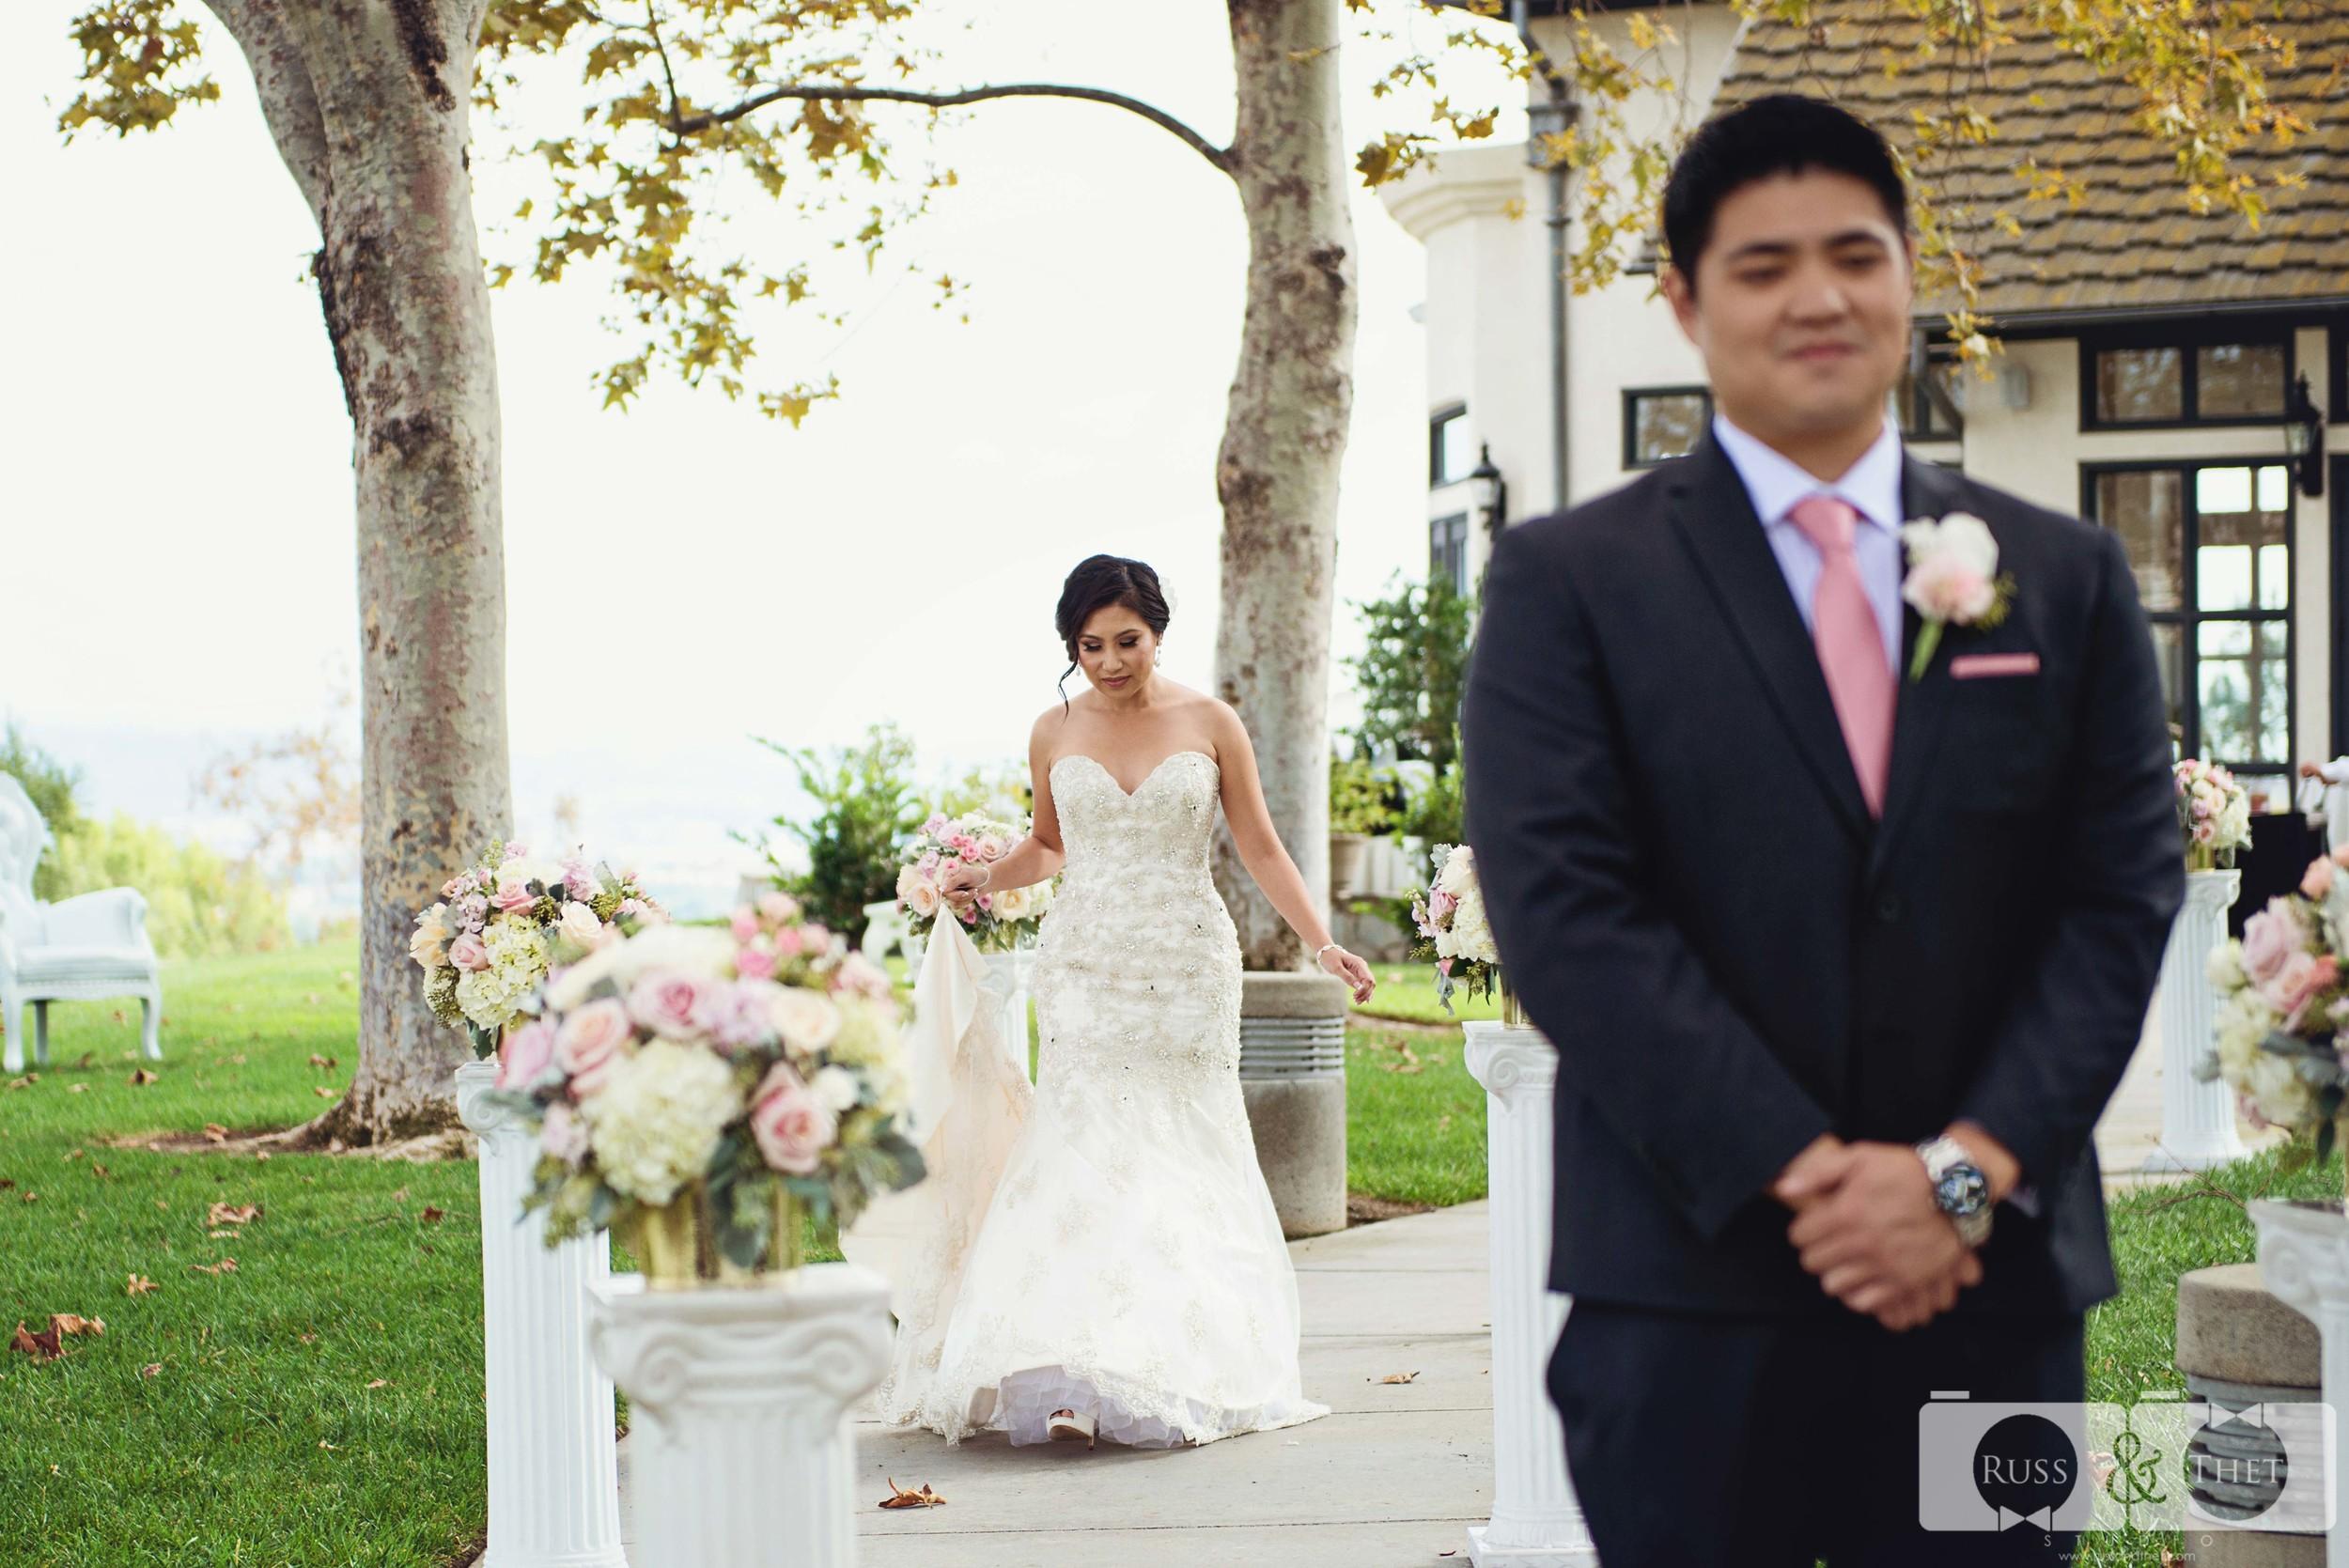 summit-house-fullerton-wedding-photographer-45.JPG